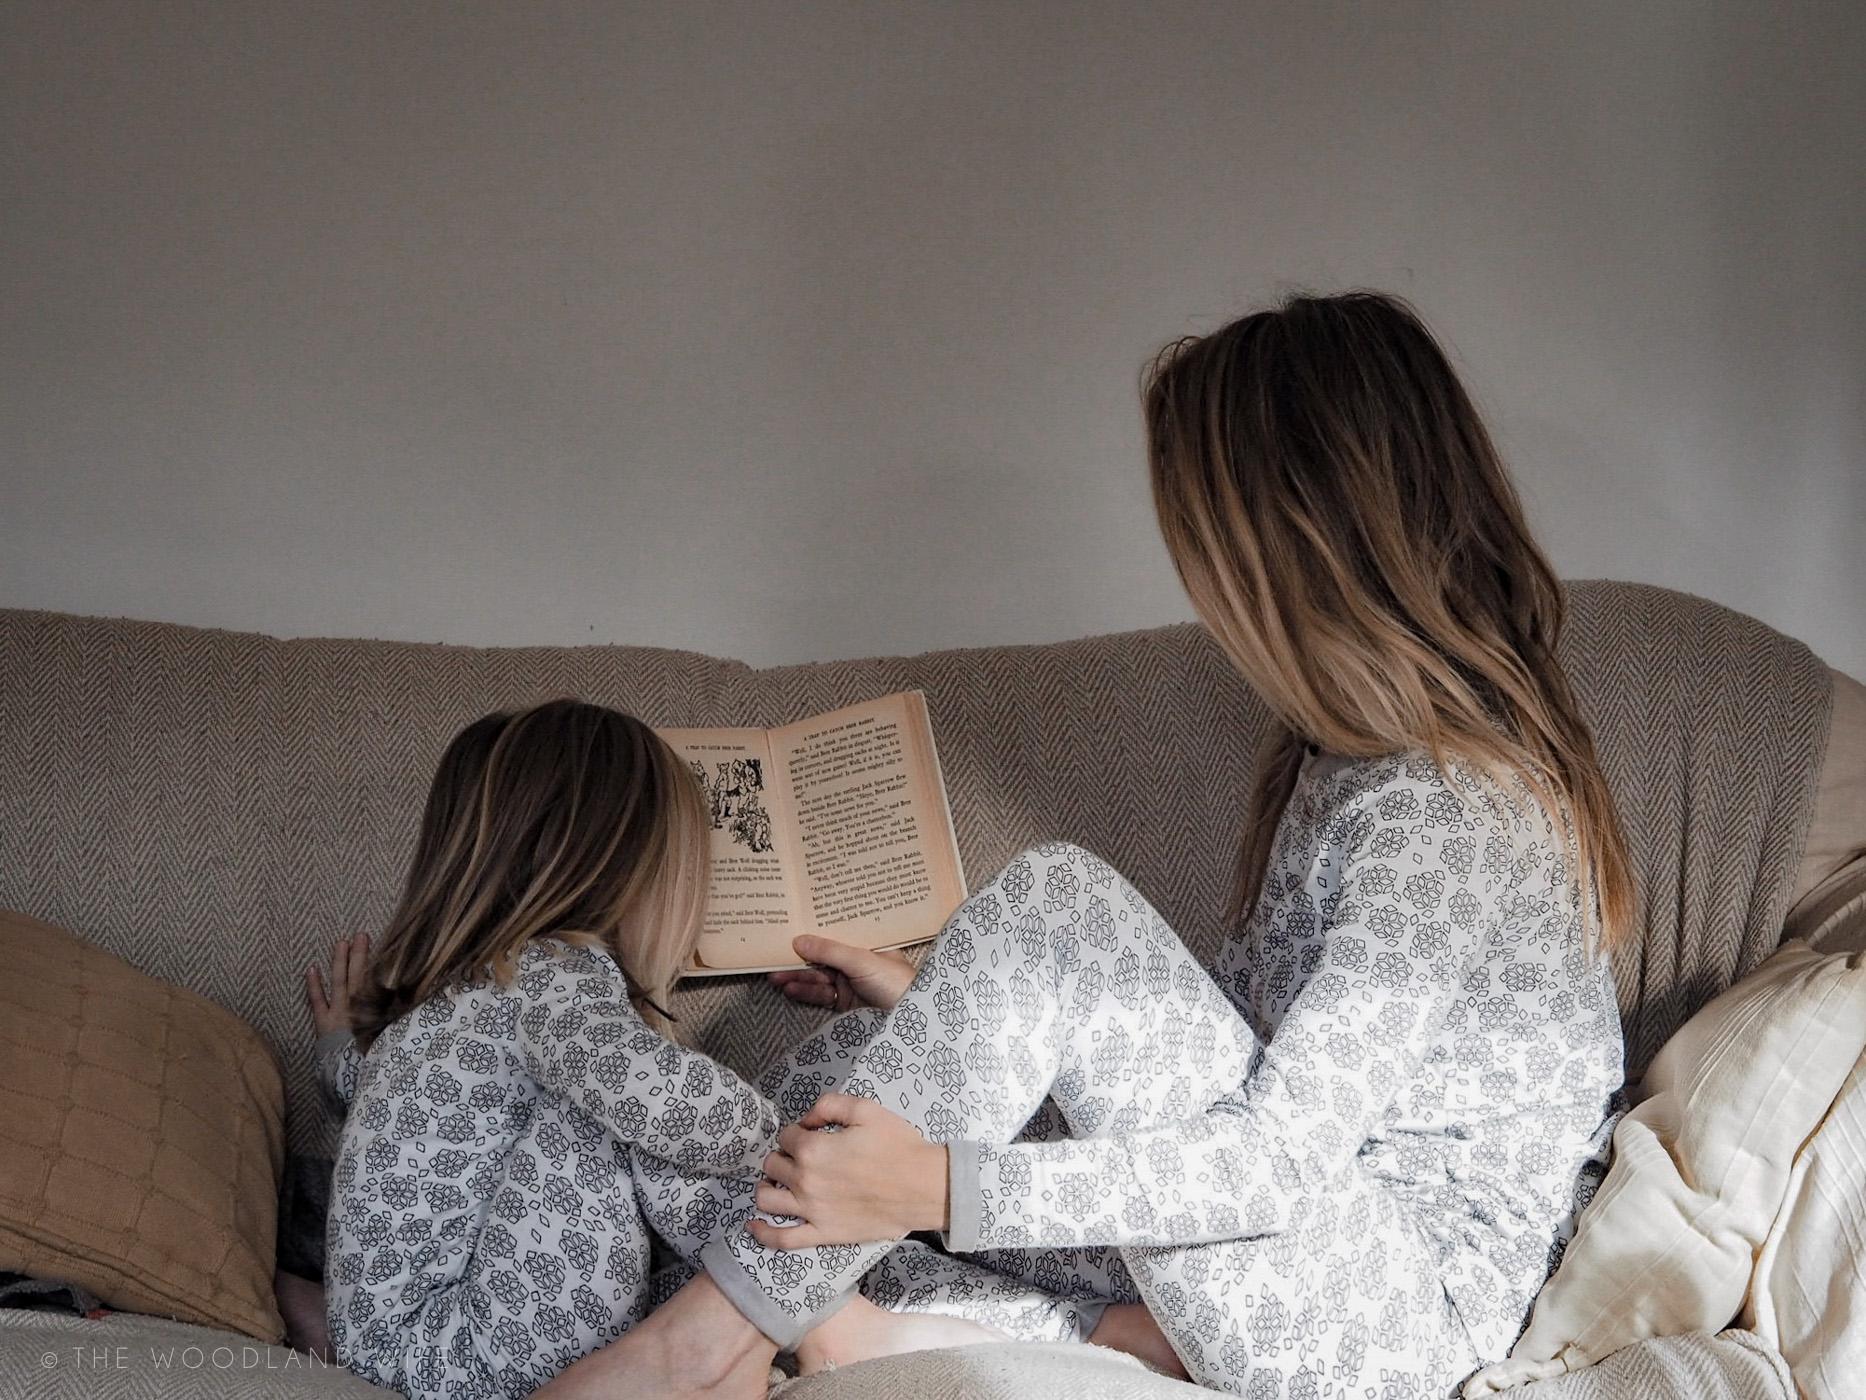 The Woodland Wife - Birthdays when you become a Mummy - The Bright Company - Sleepwear - PJs - Nightwear - Ethical